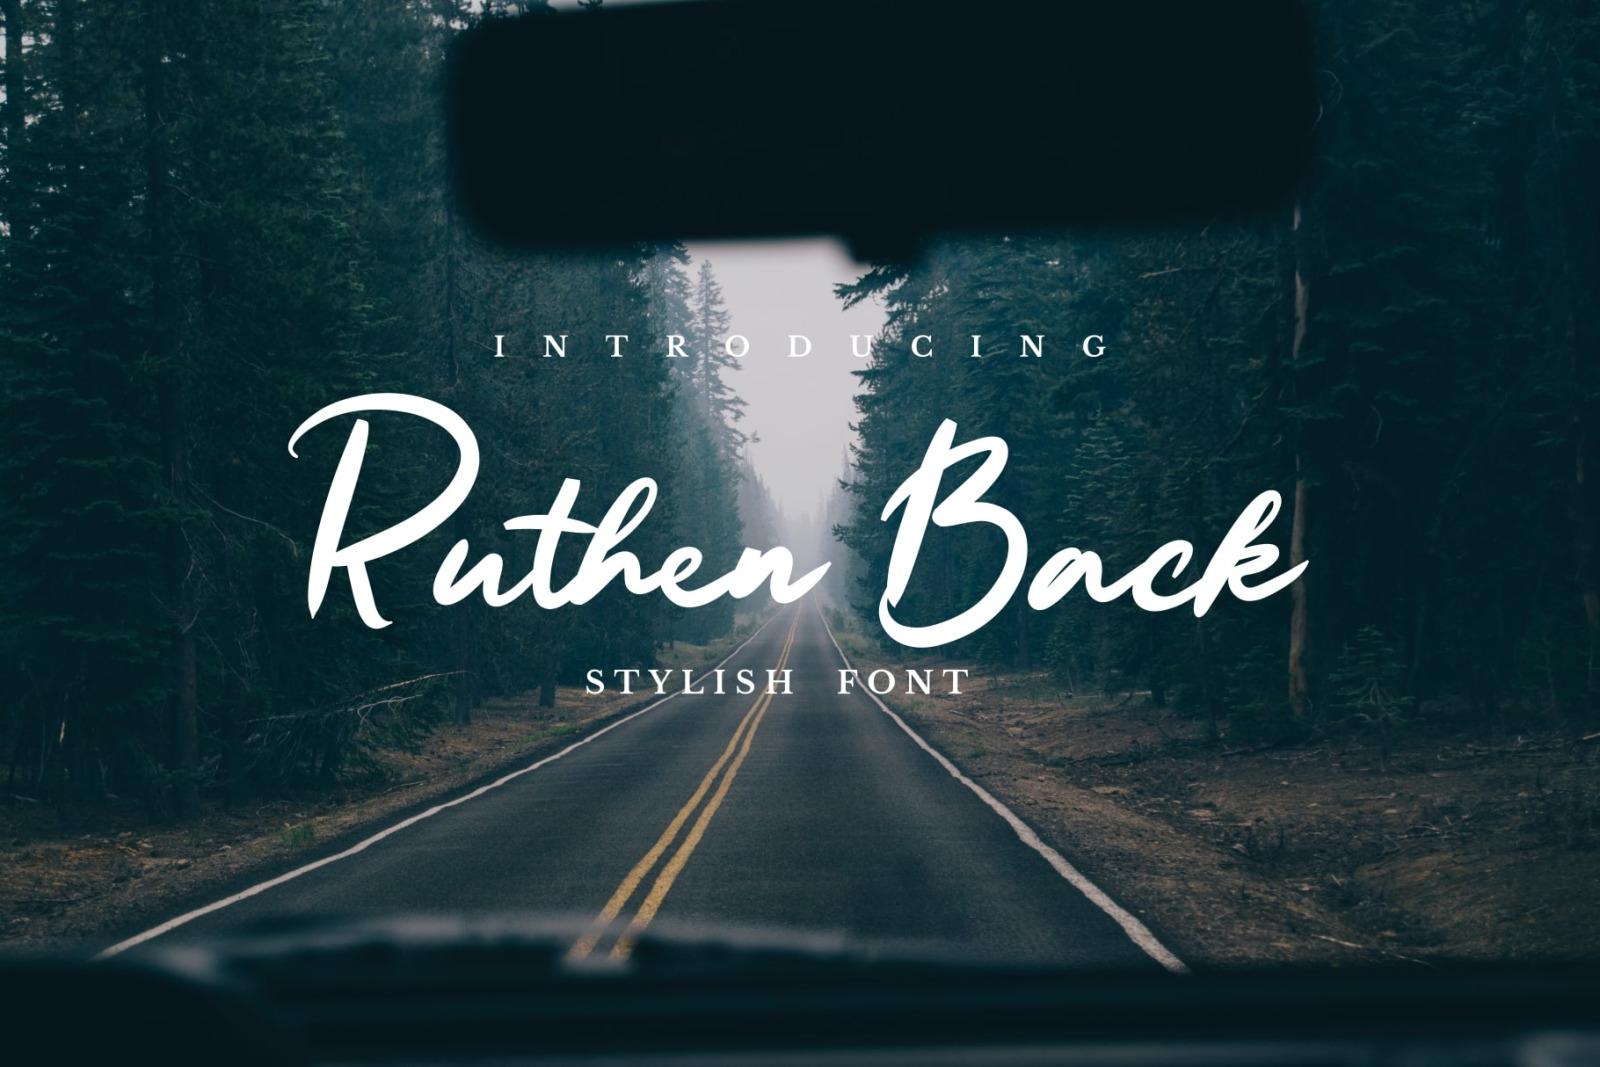 Ruthen Back - Stylish Font